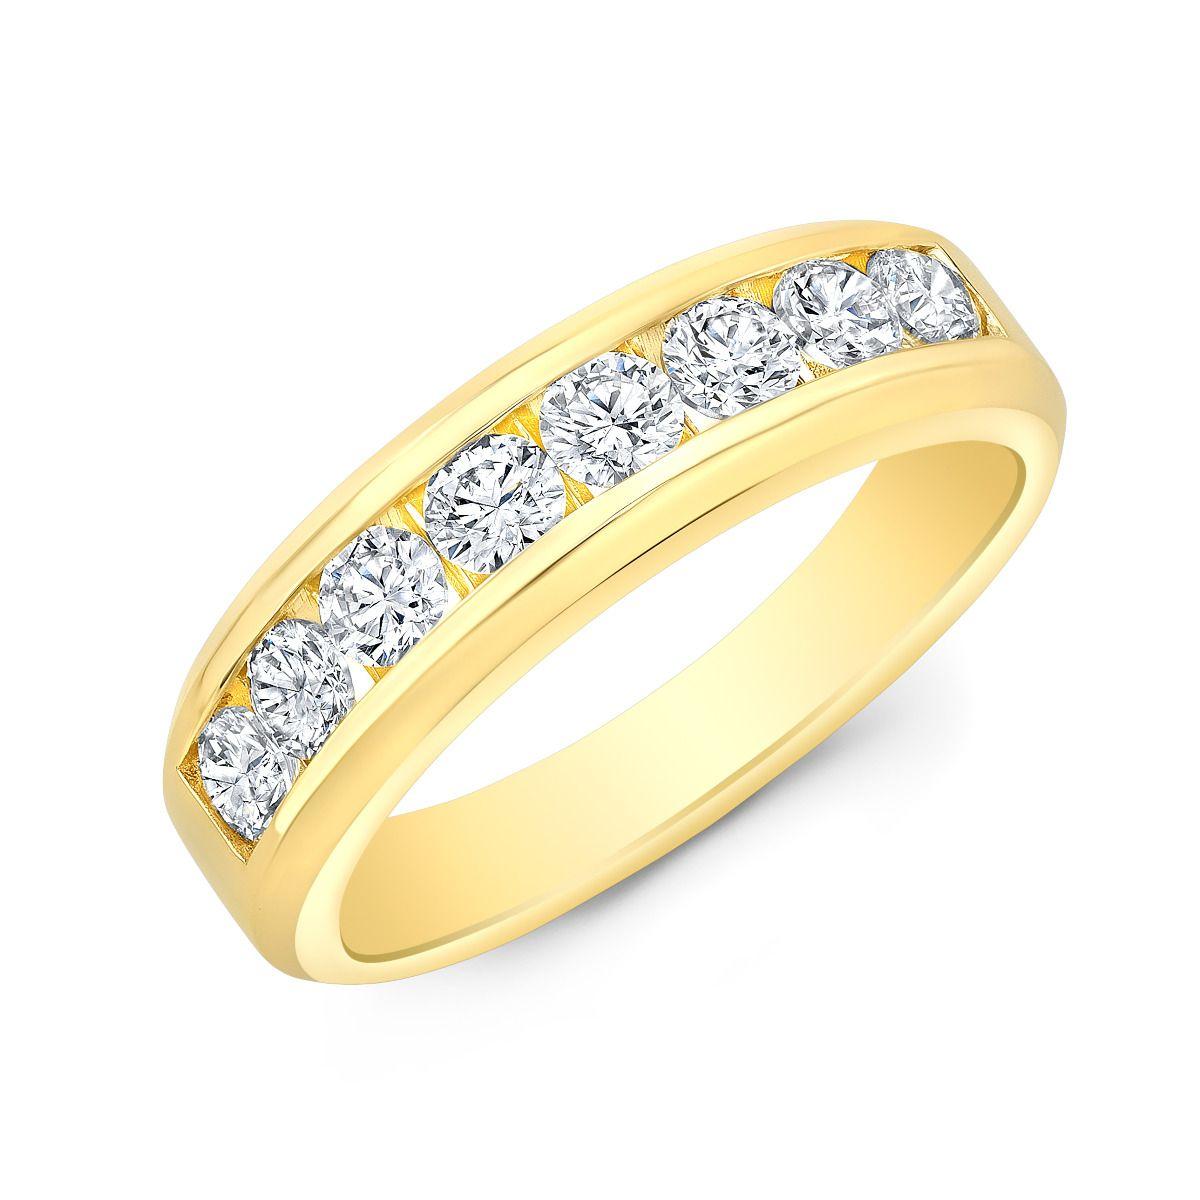 1.50 Carat Round Channel Set Men's Diamond Wedding Band